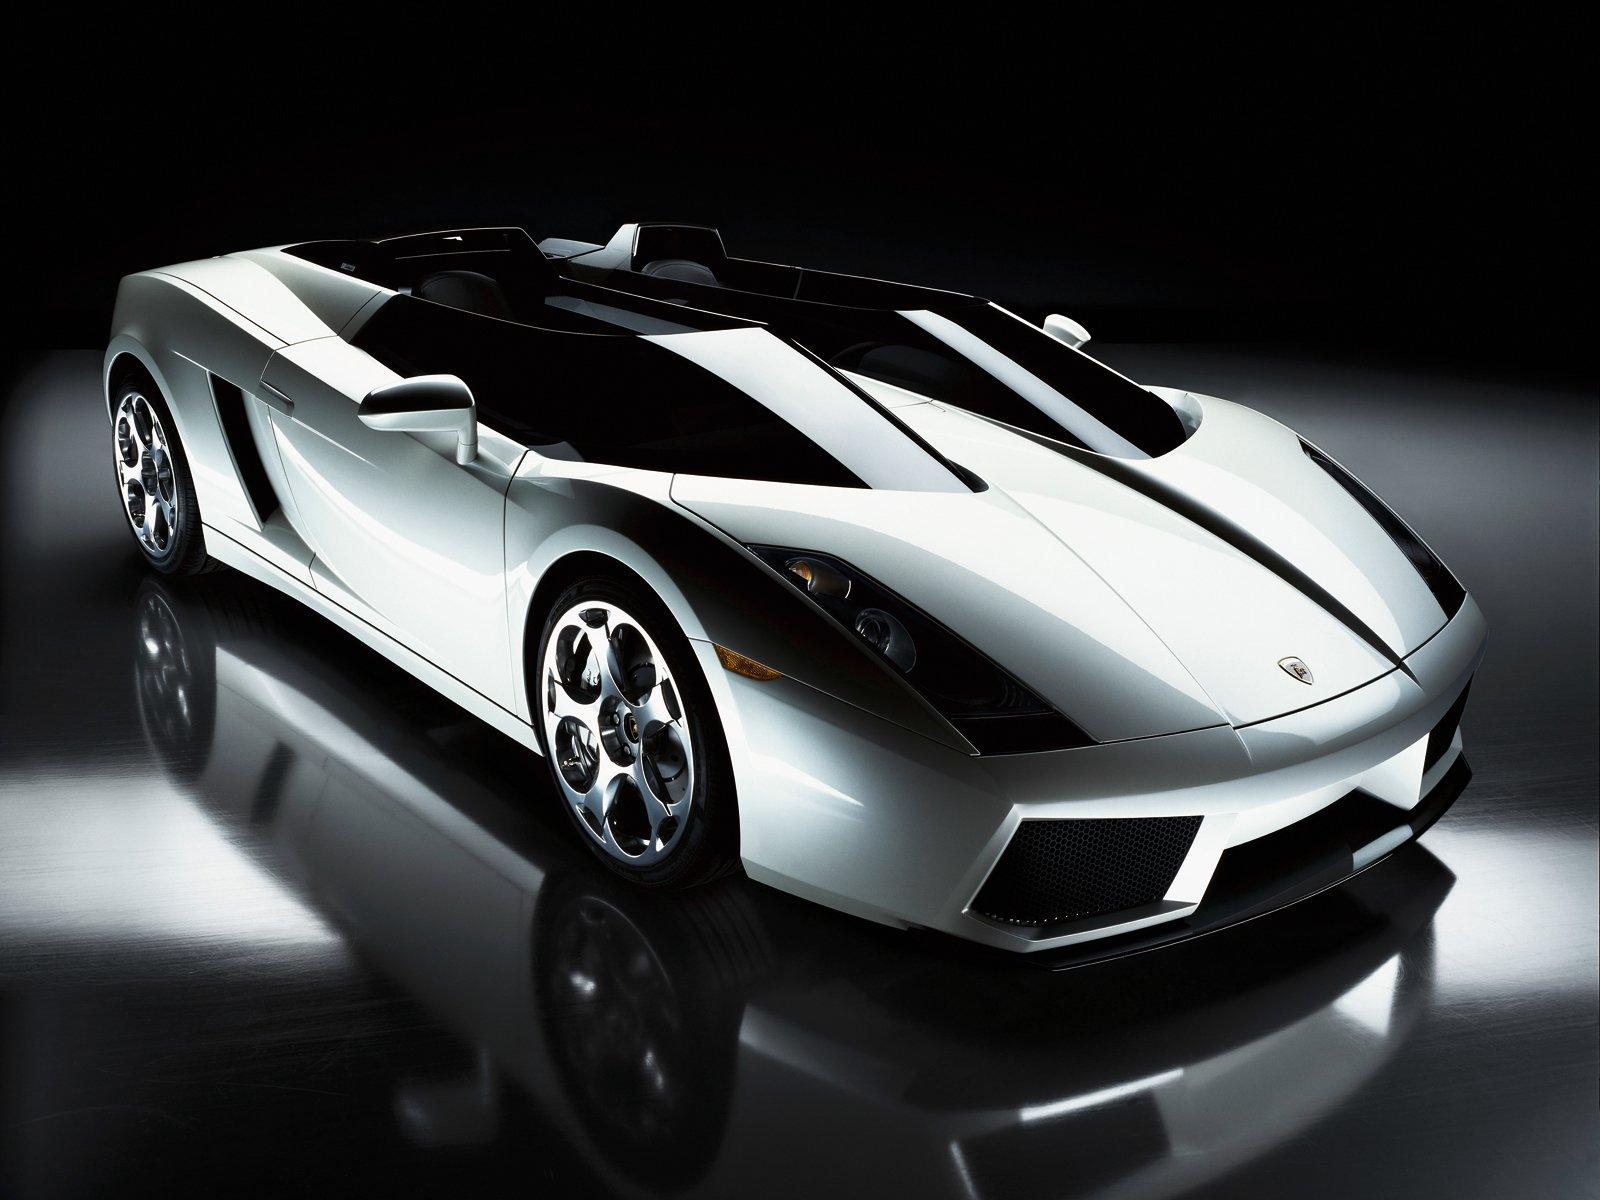 http://1.bp.blogspot.com/_V6TVDECge74/TBtWJXwemeI/AAAAAAAAAj4/a6UNcUtnEl8/s1600/+Lamborghini+Concept+S.jpg